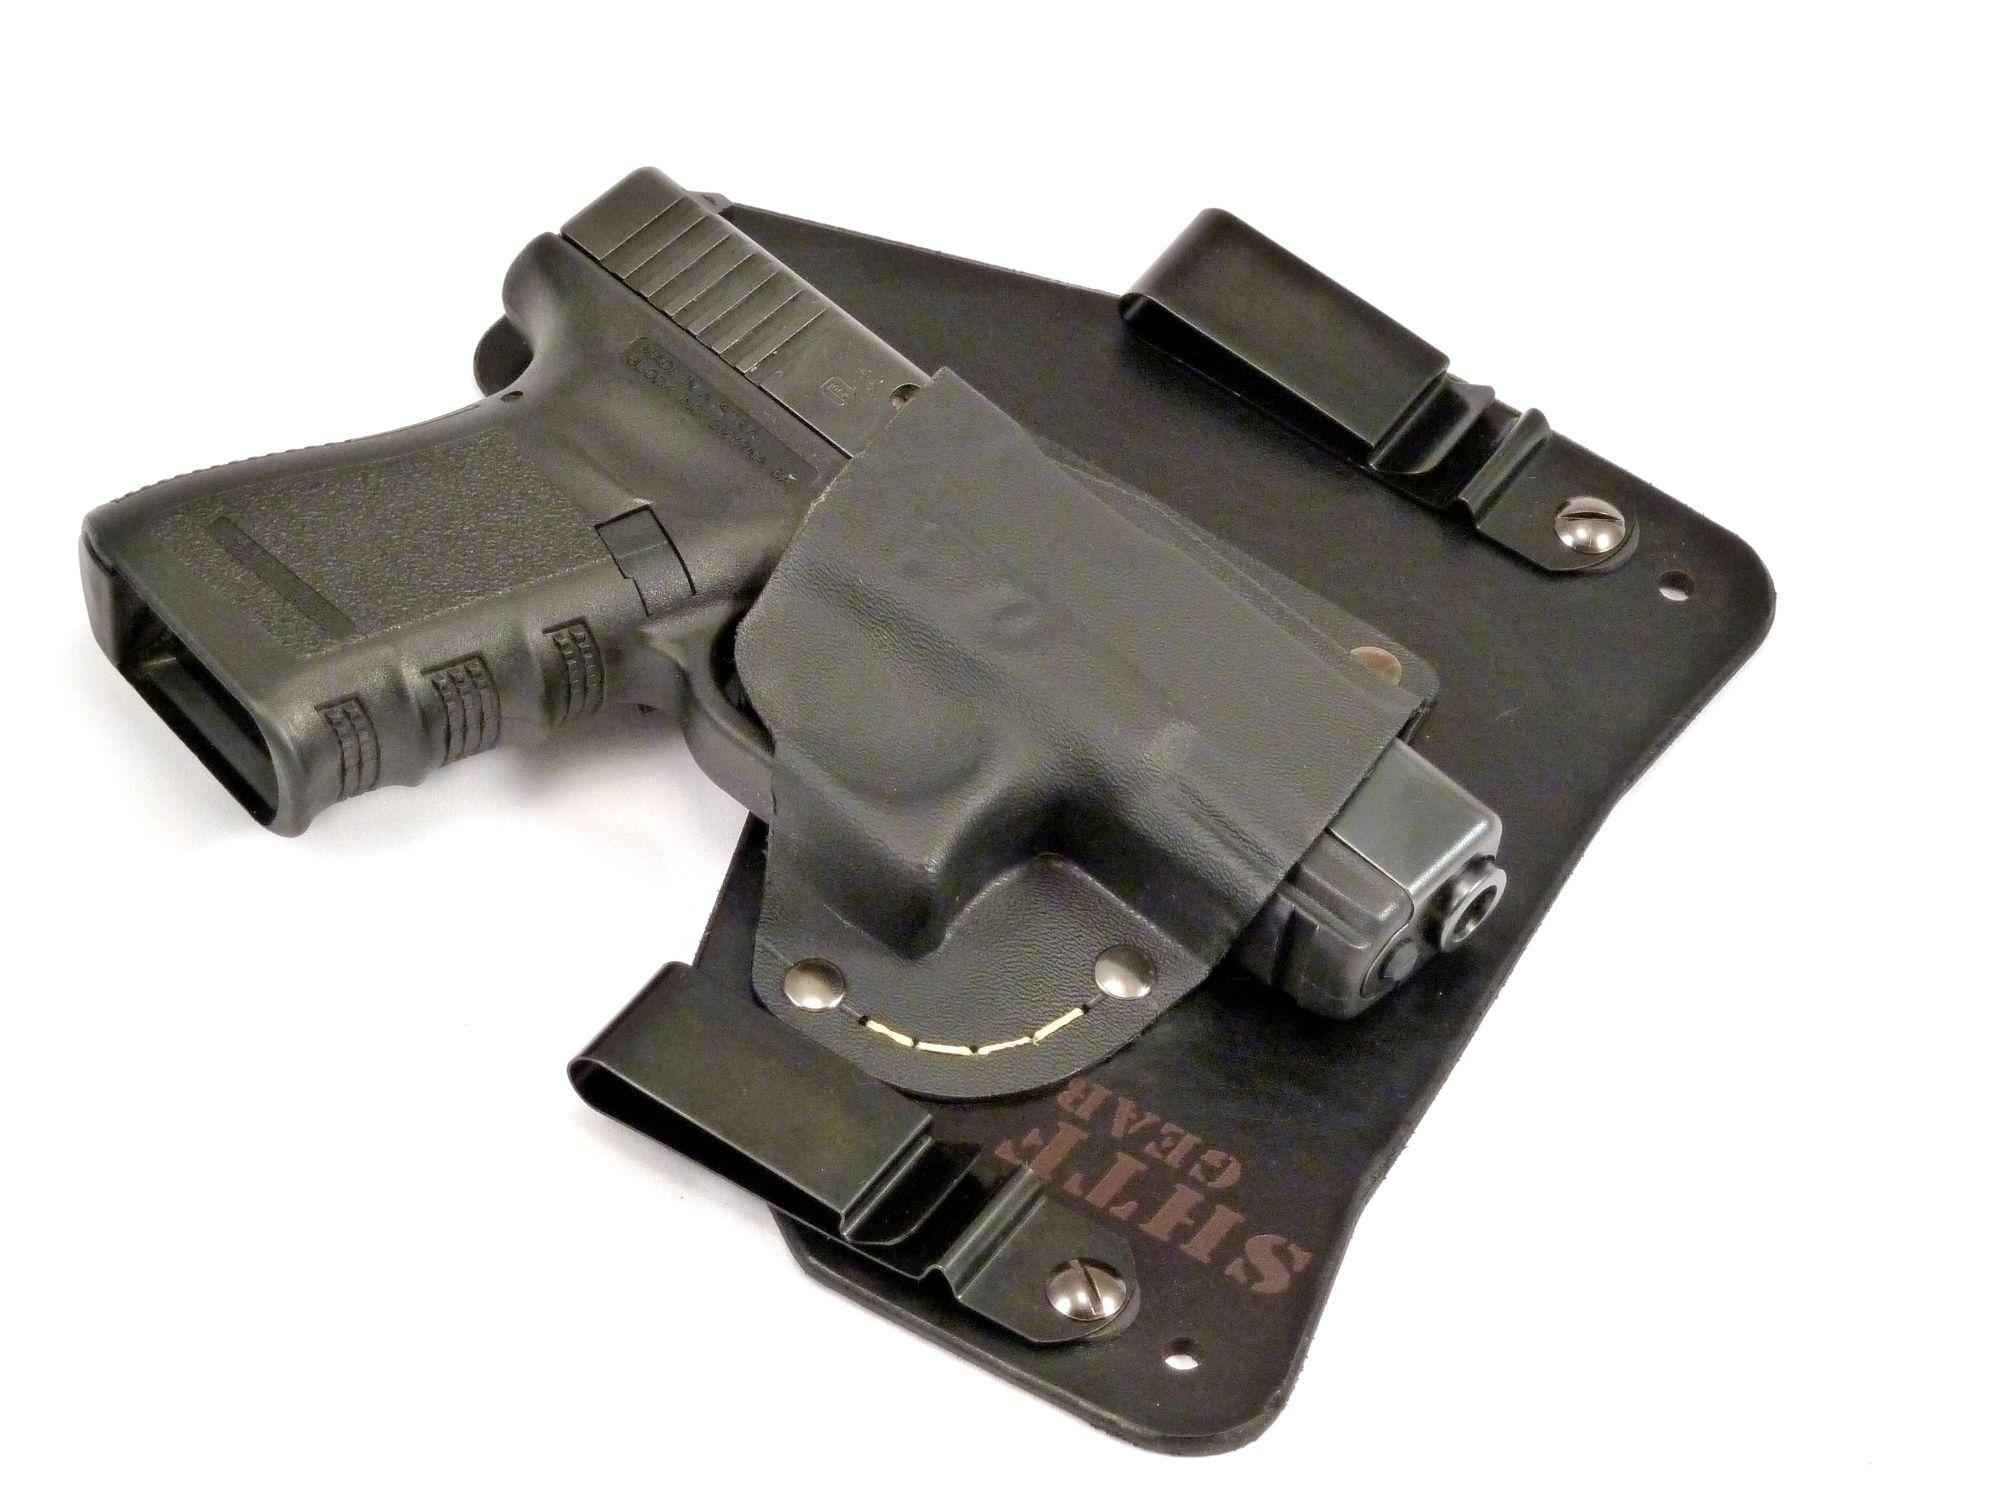 business casual carry for slim guy-glock-gun-front-left-1500.jpg